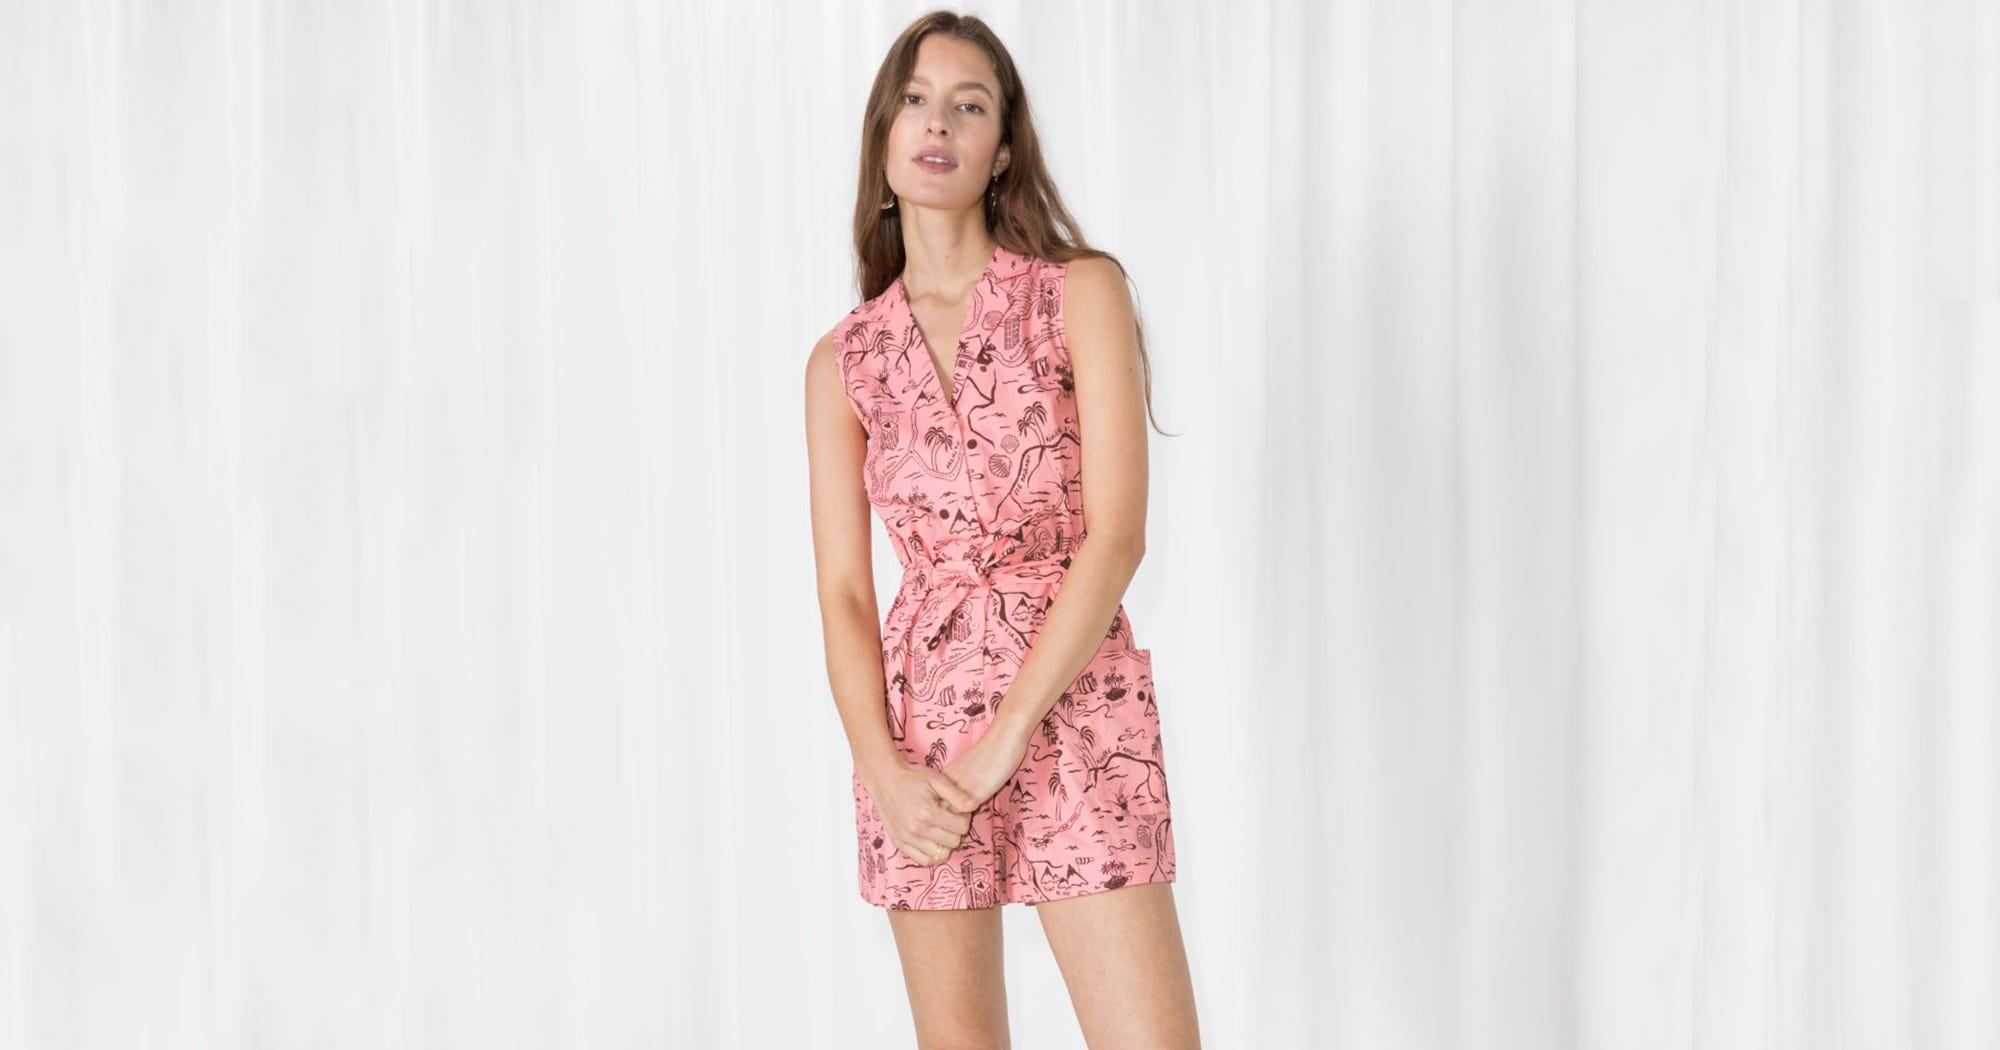 97fe1bfd4b7 Beach Cover Ups - Best Summer Dress Styles